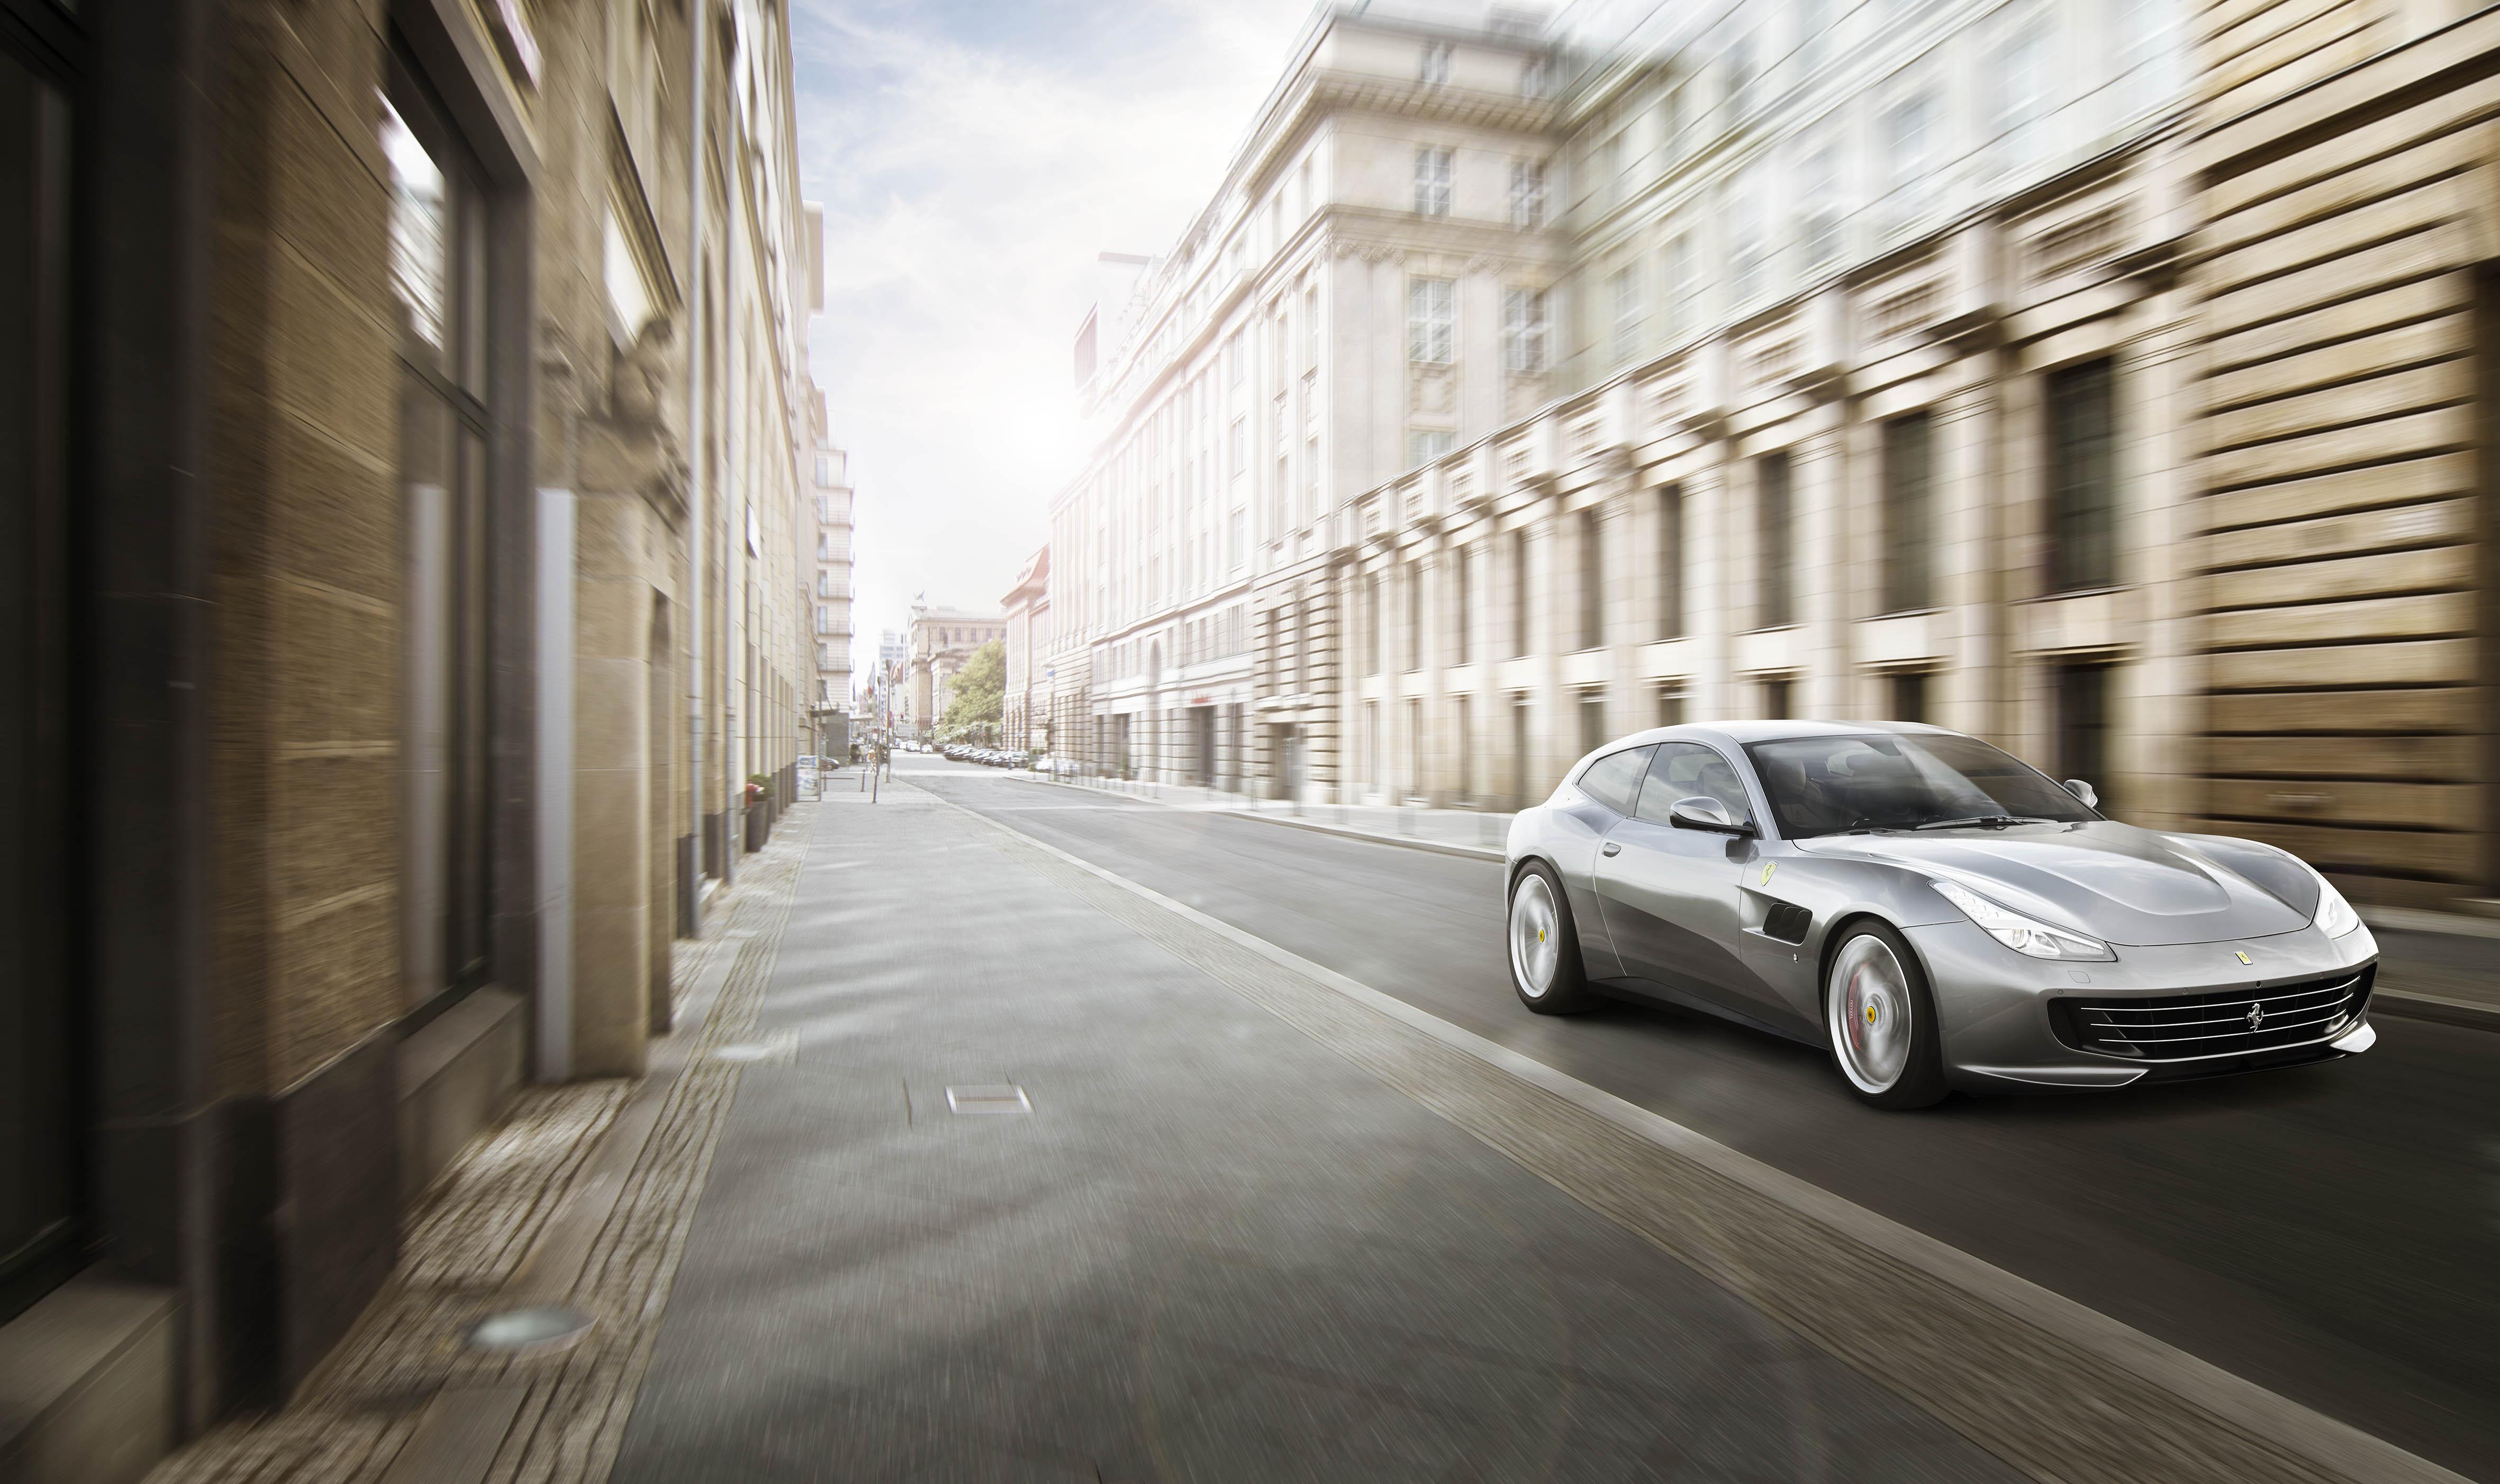 Ferrari GTC4Lusso T Adopts Turbo V8, Rear-Wheel Drive